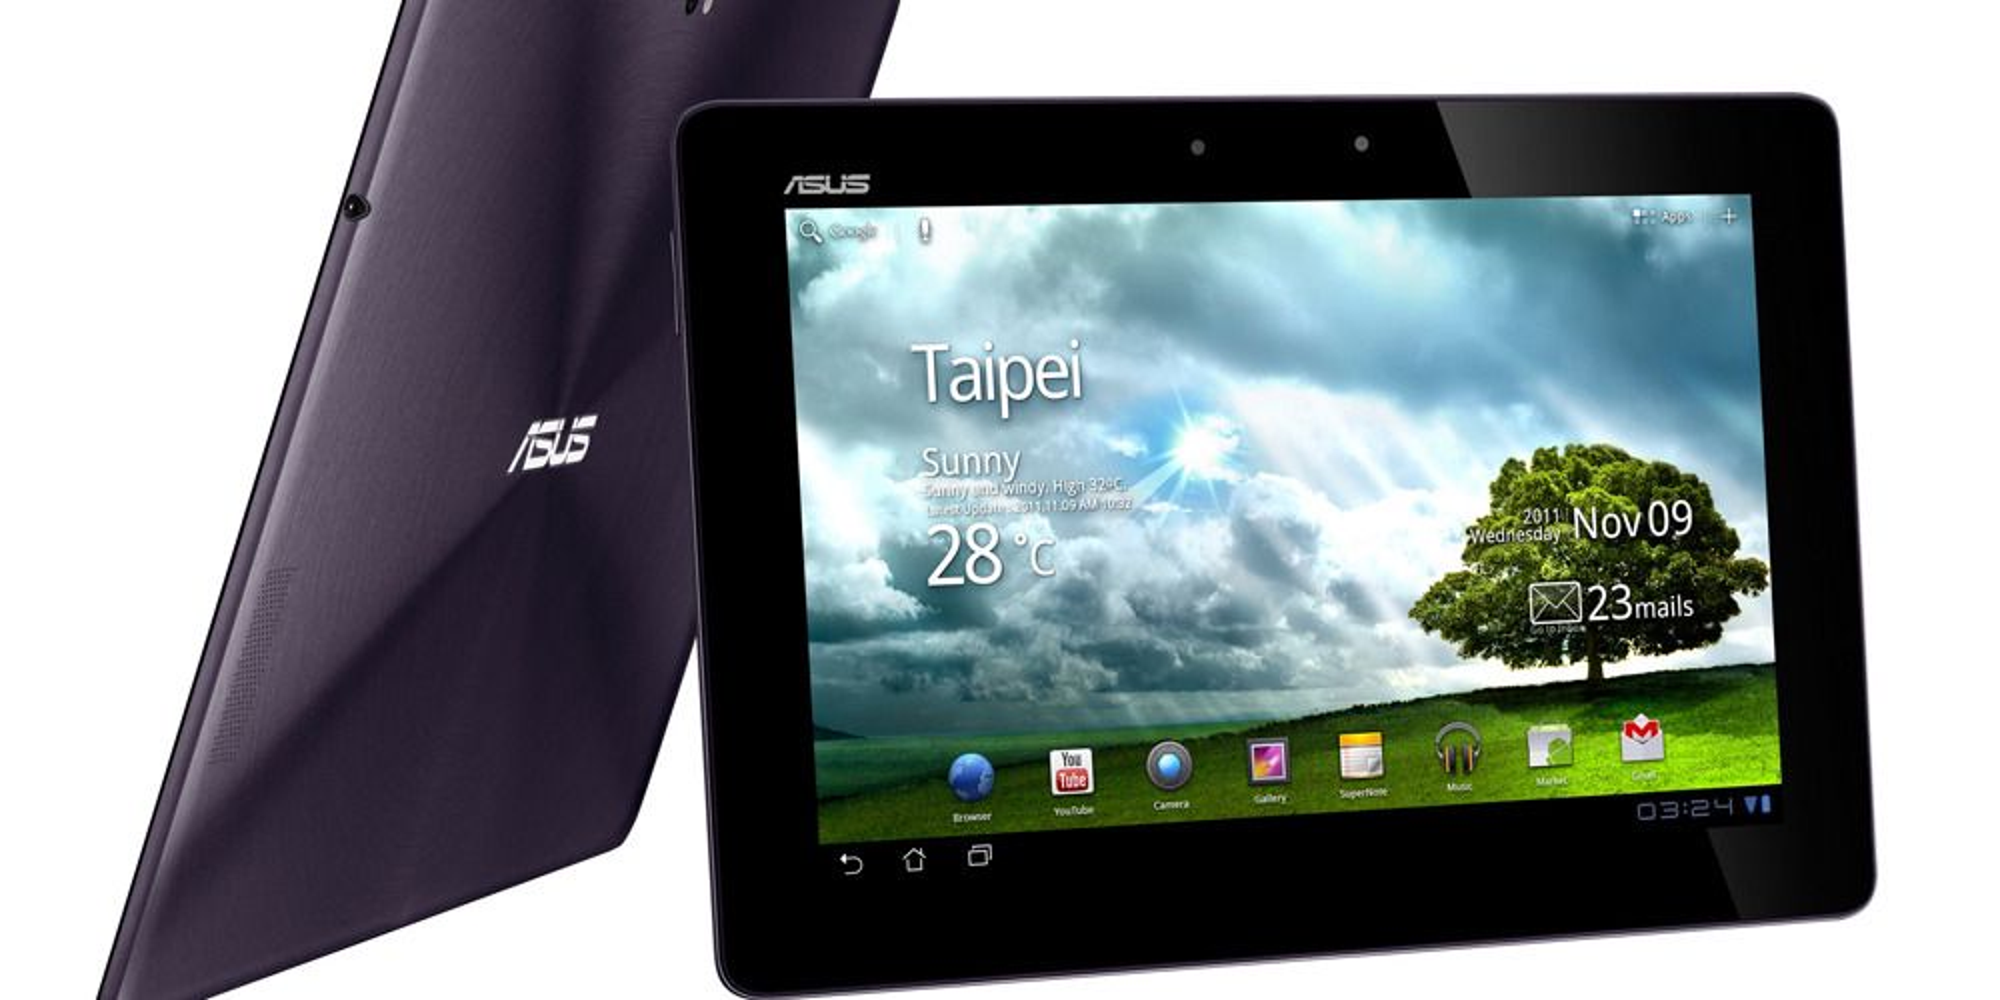 Asus lanserer Hulken-tablet